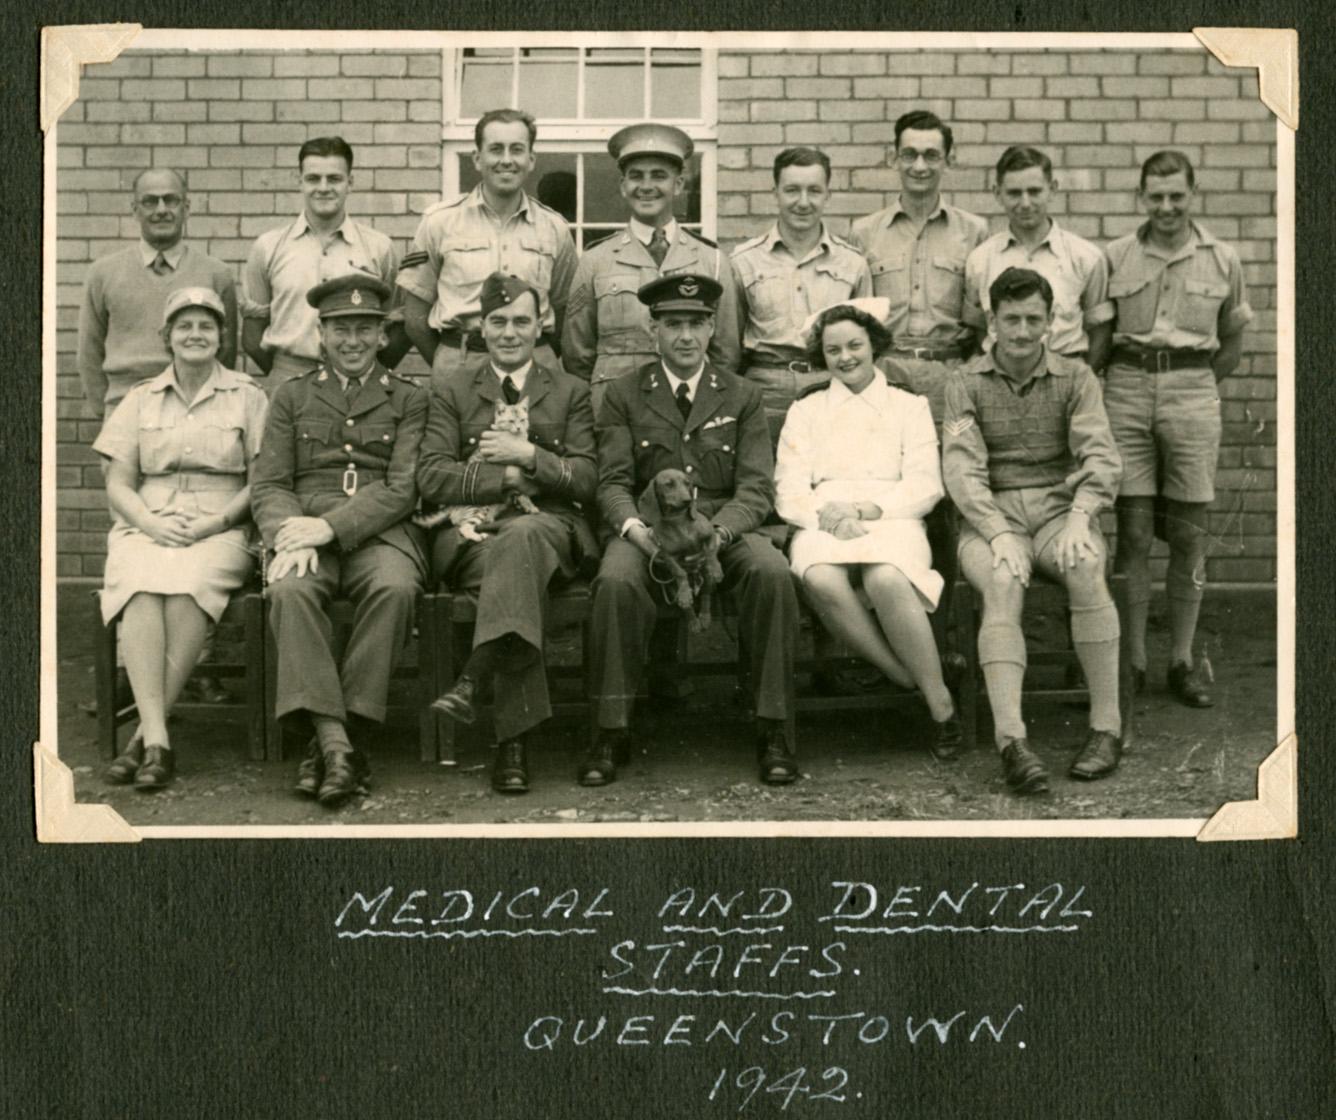 Roy-Baker-Dental-Staff-RAF-Queenstown.jpg